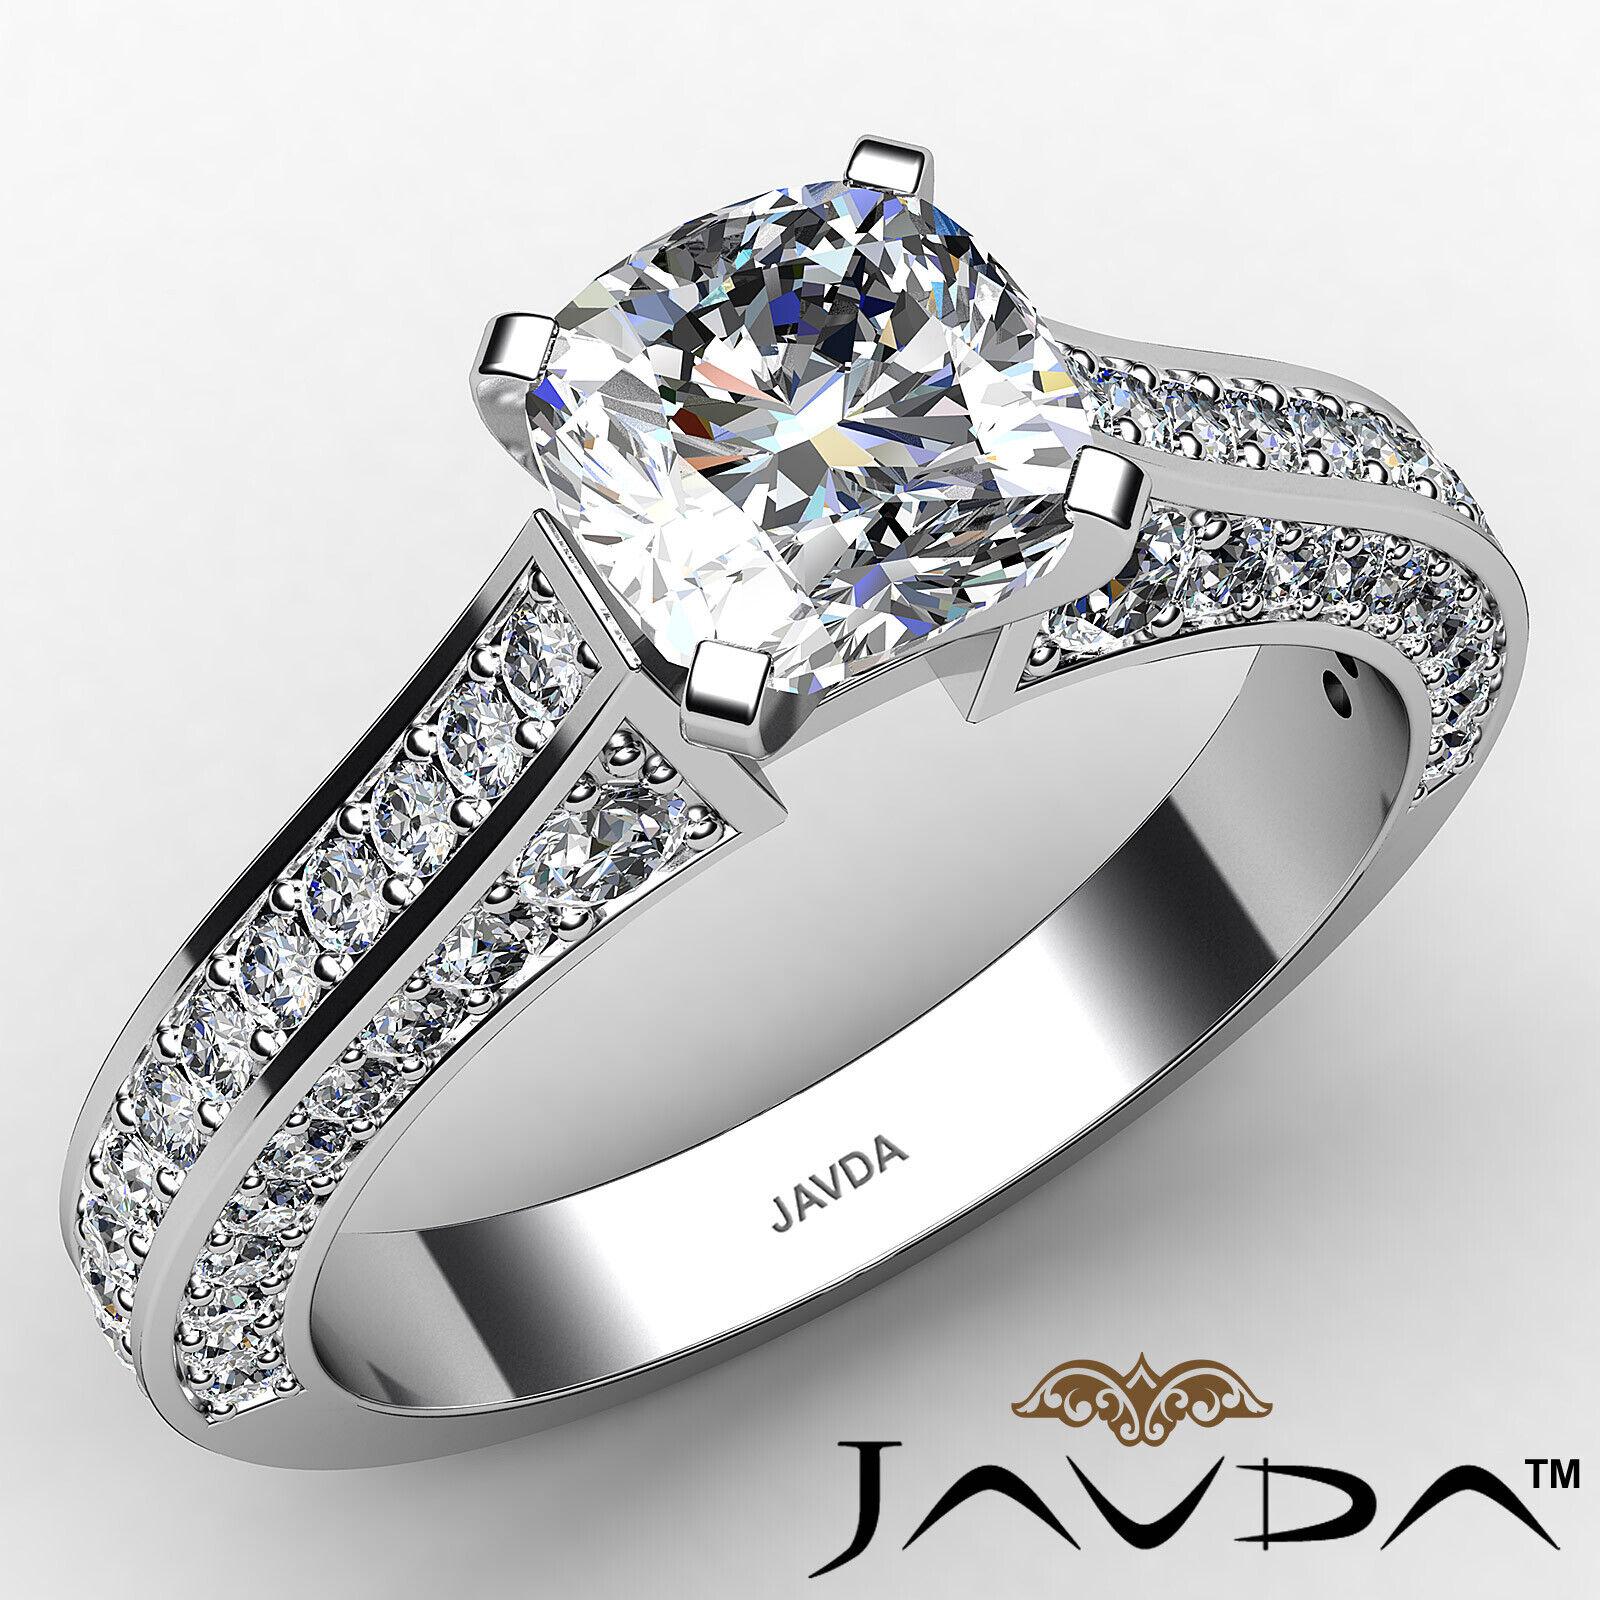 Cushion Diamond Engagement Pave Set Ring GIA J Color & VS2 clarity 1.82ctw